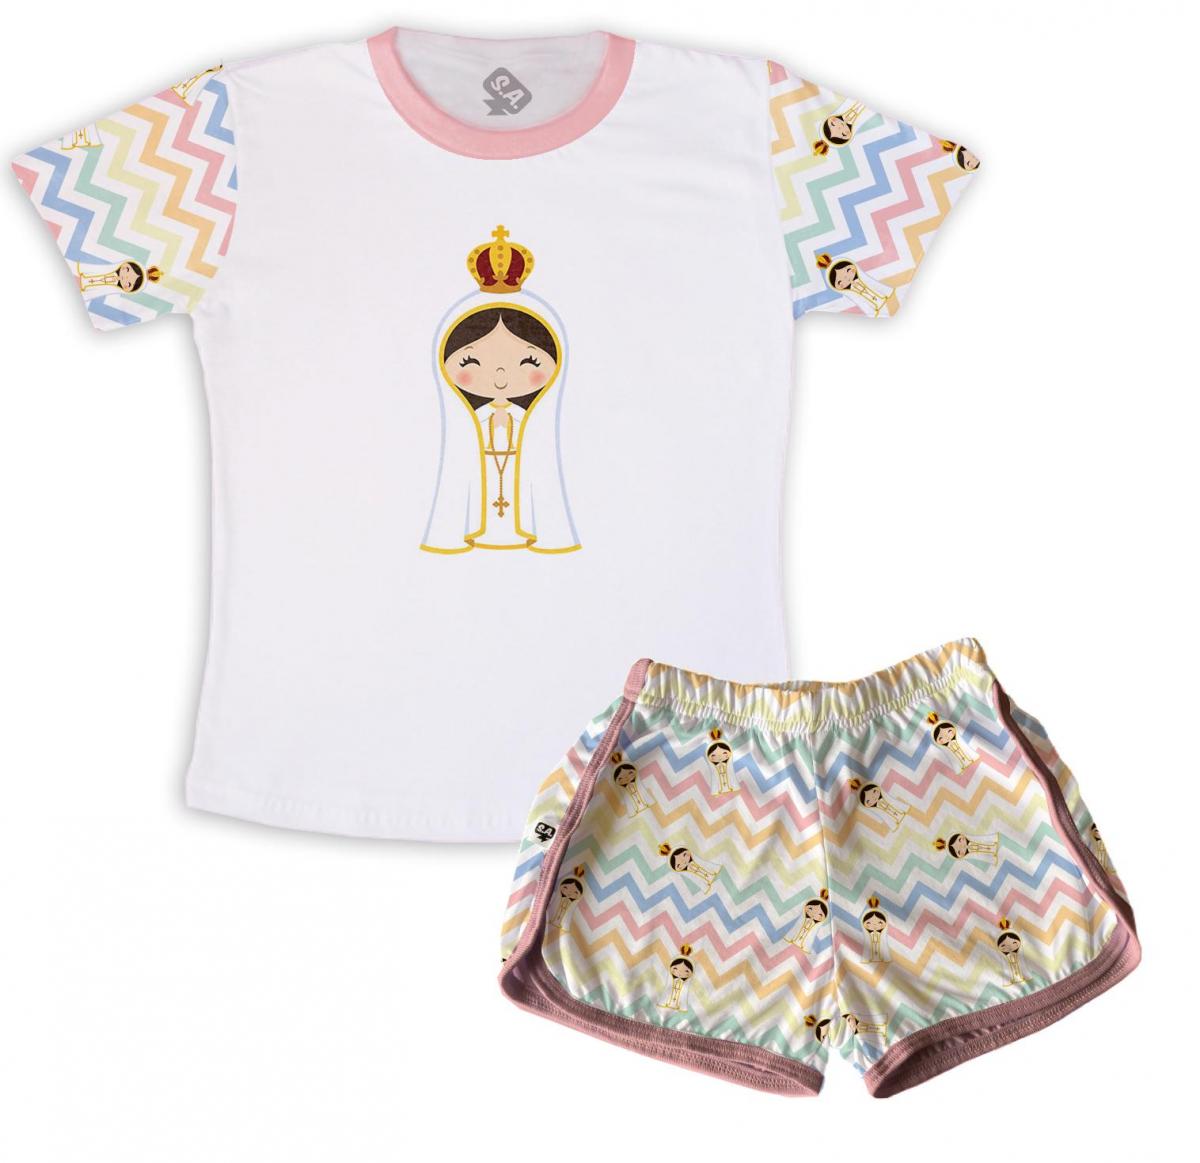 Pijama Feminino Infantil Malha Tema Nossa Senhora Aprecida